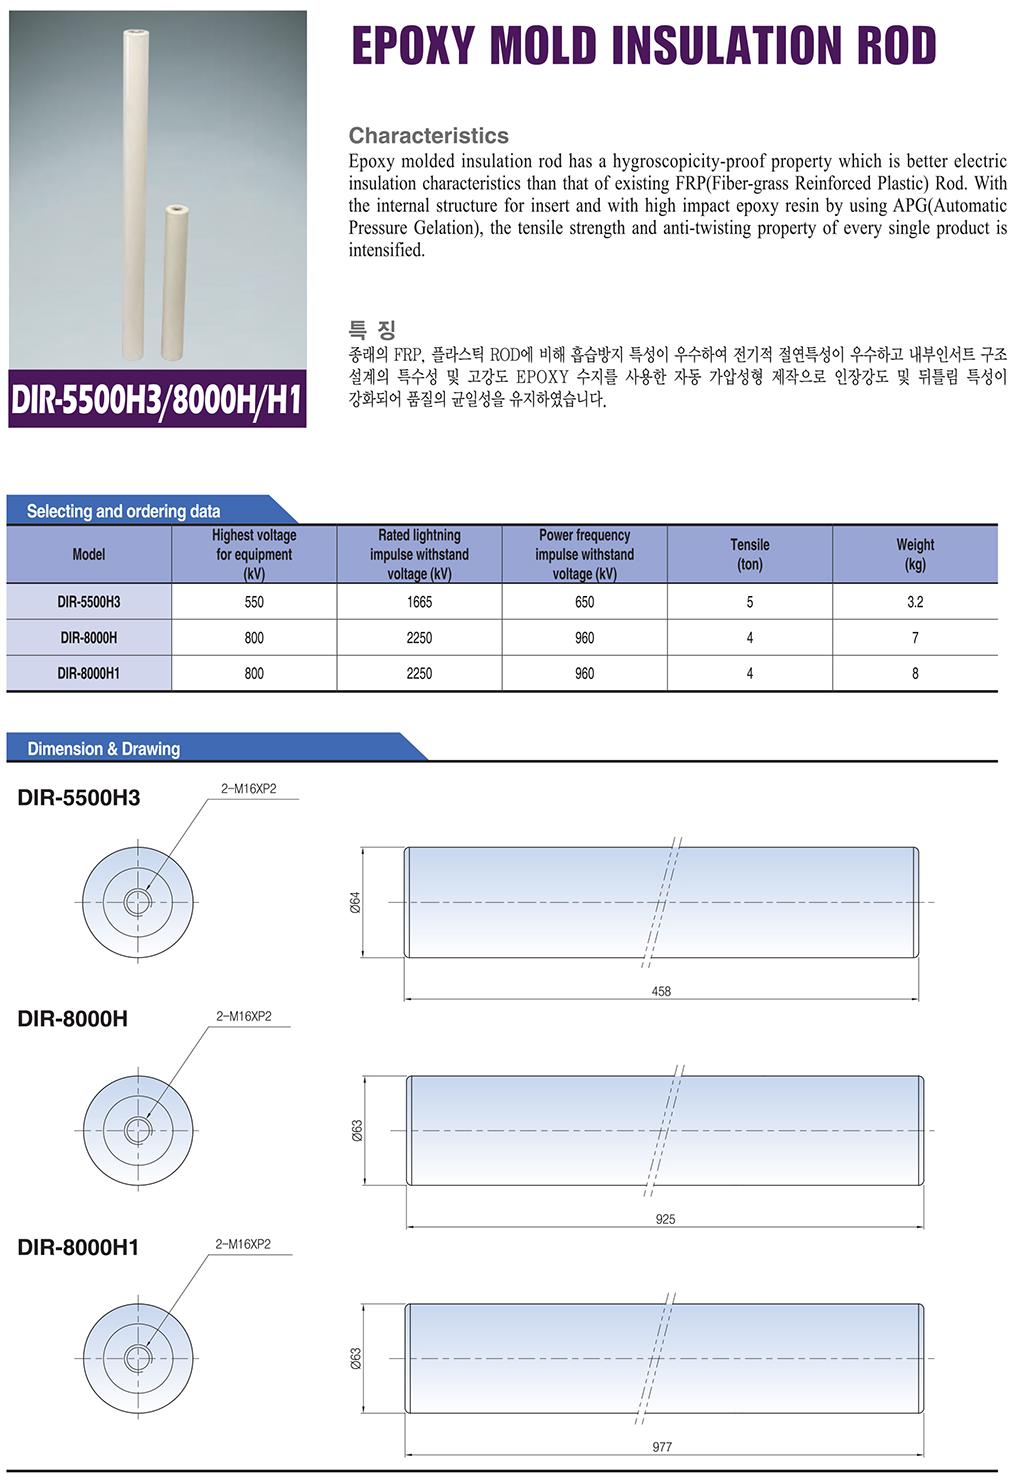 DONGWOO Epoxy Mold Insulation Rod DIR-5500H3/8000H/H1